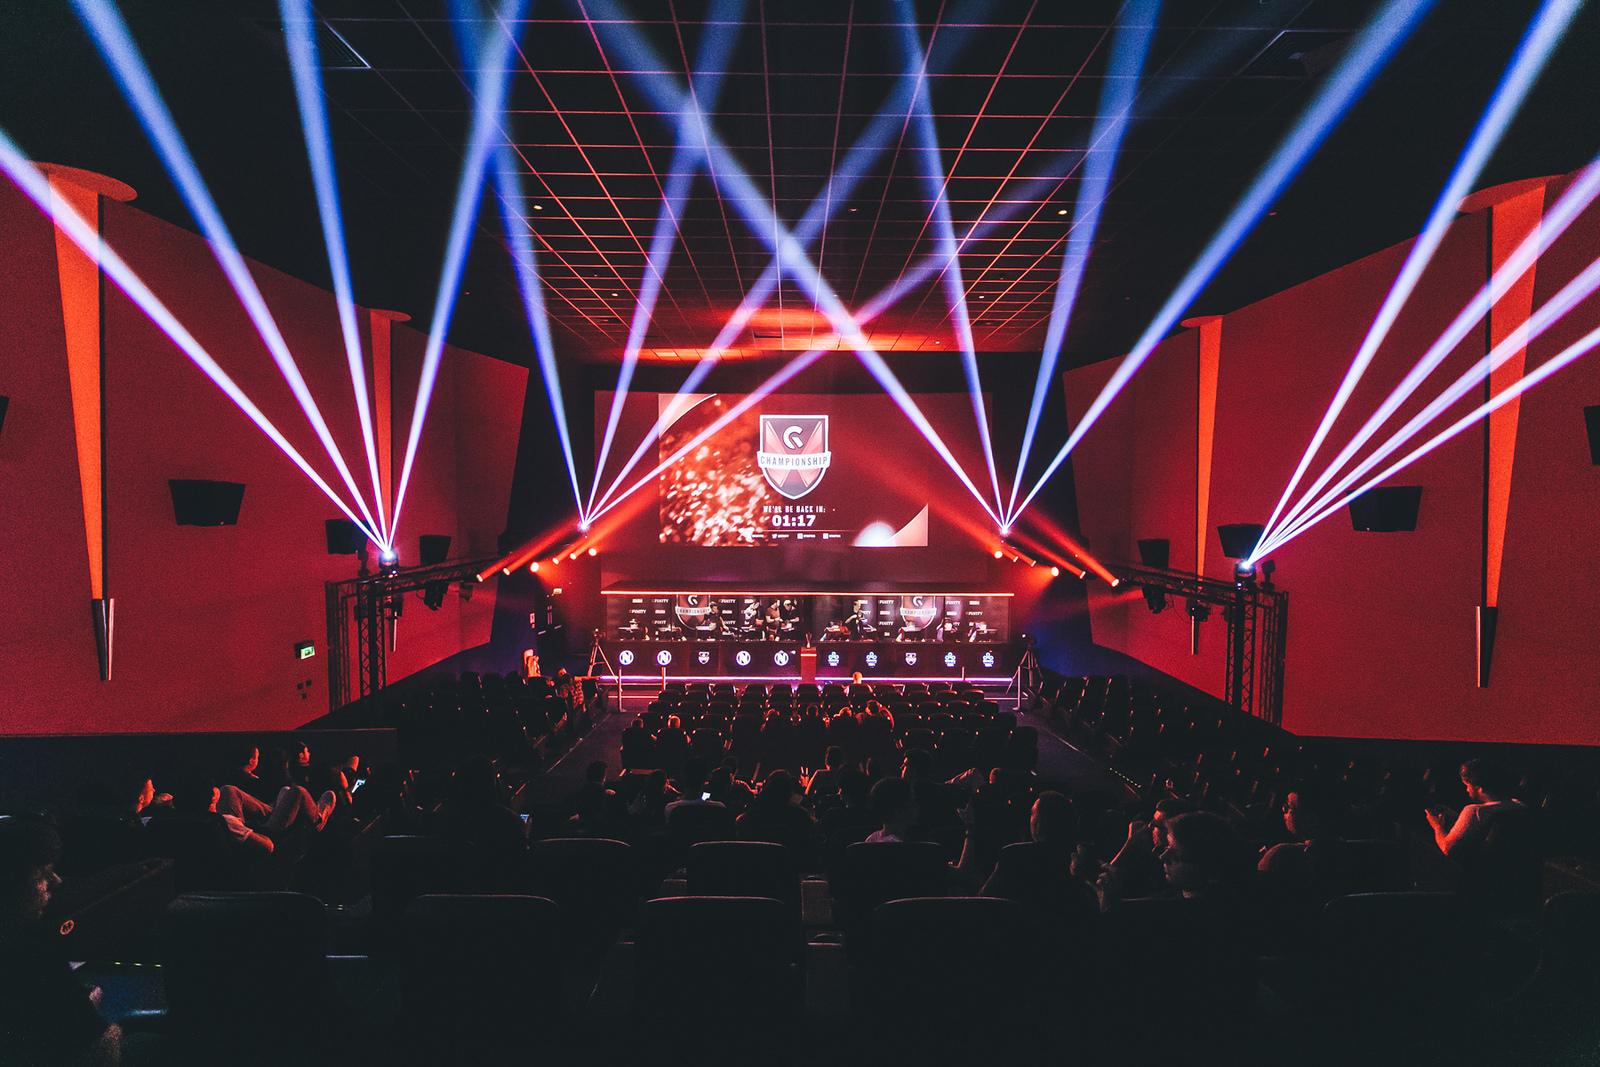 Gfinity Arena